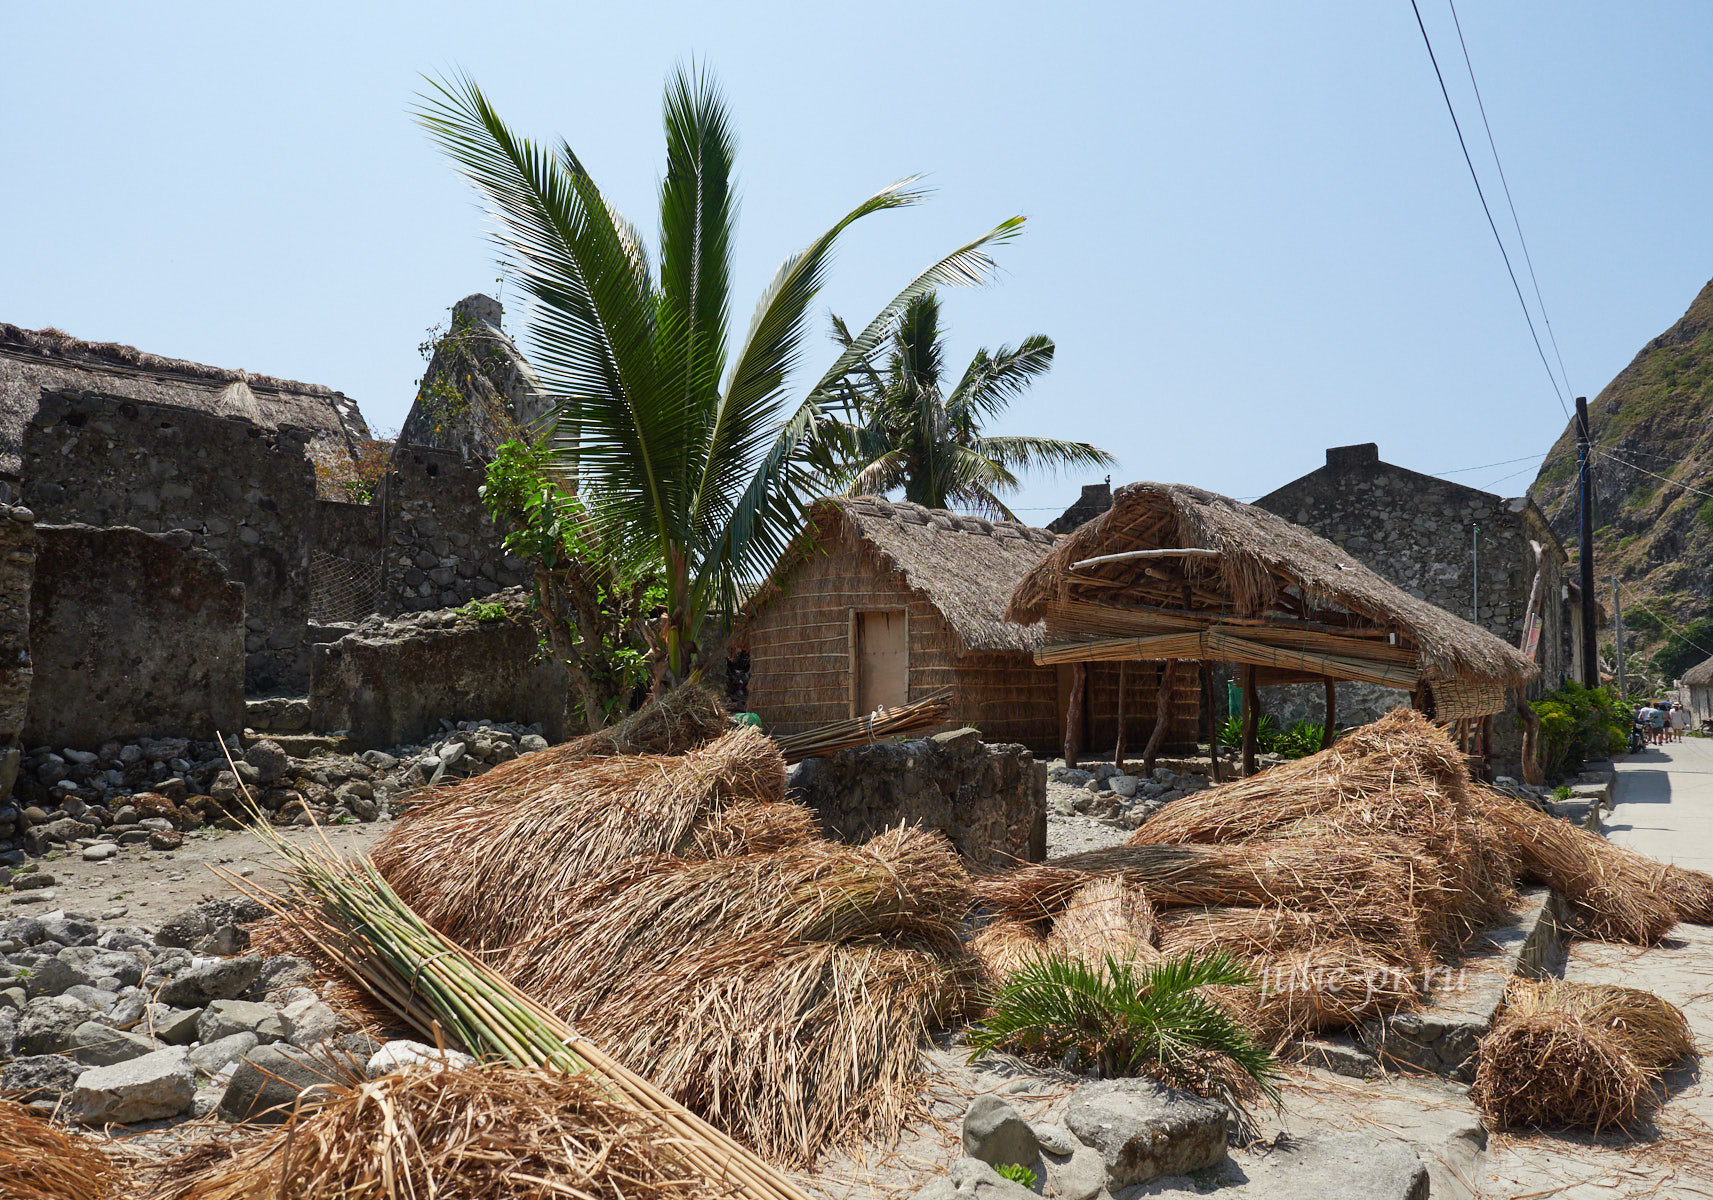 Филиппины, острова Батанес, Chavayan village